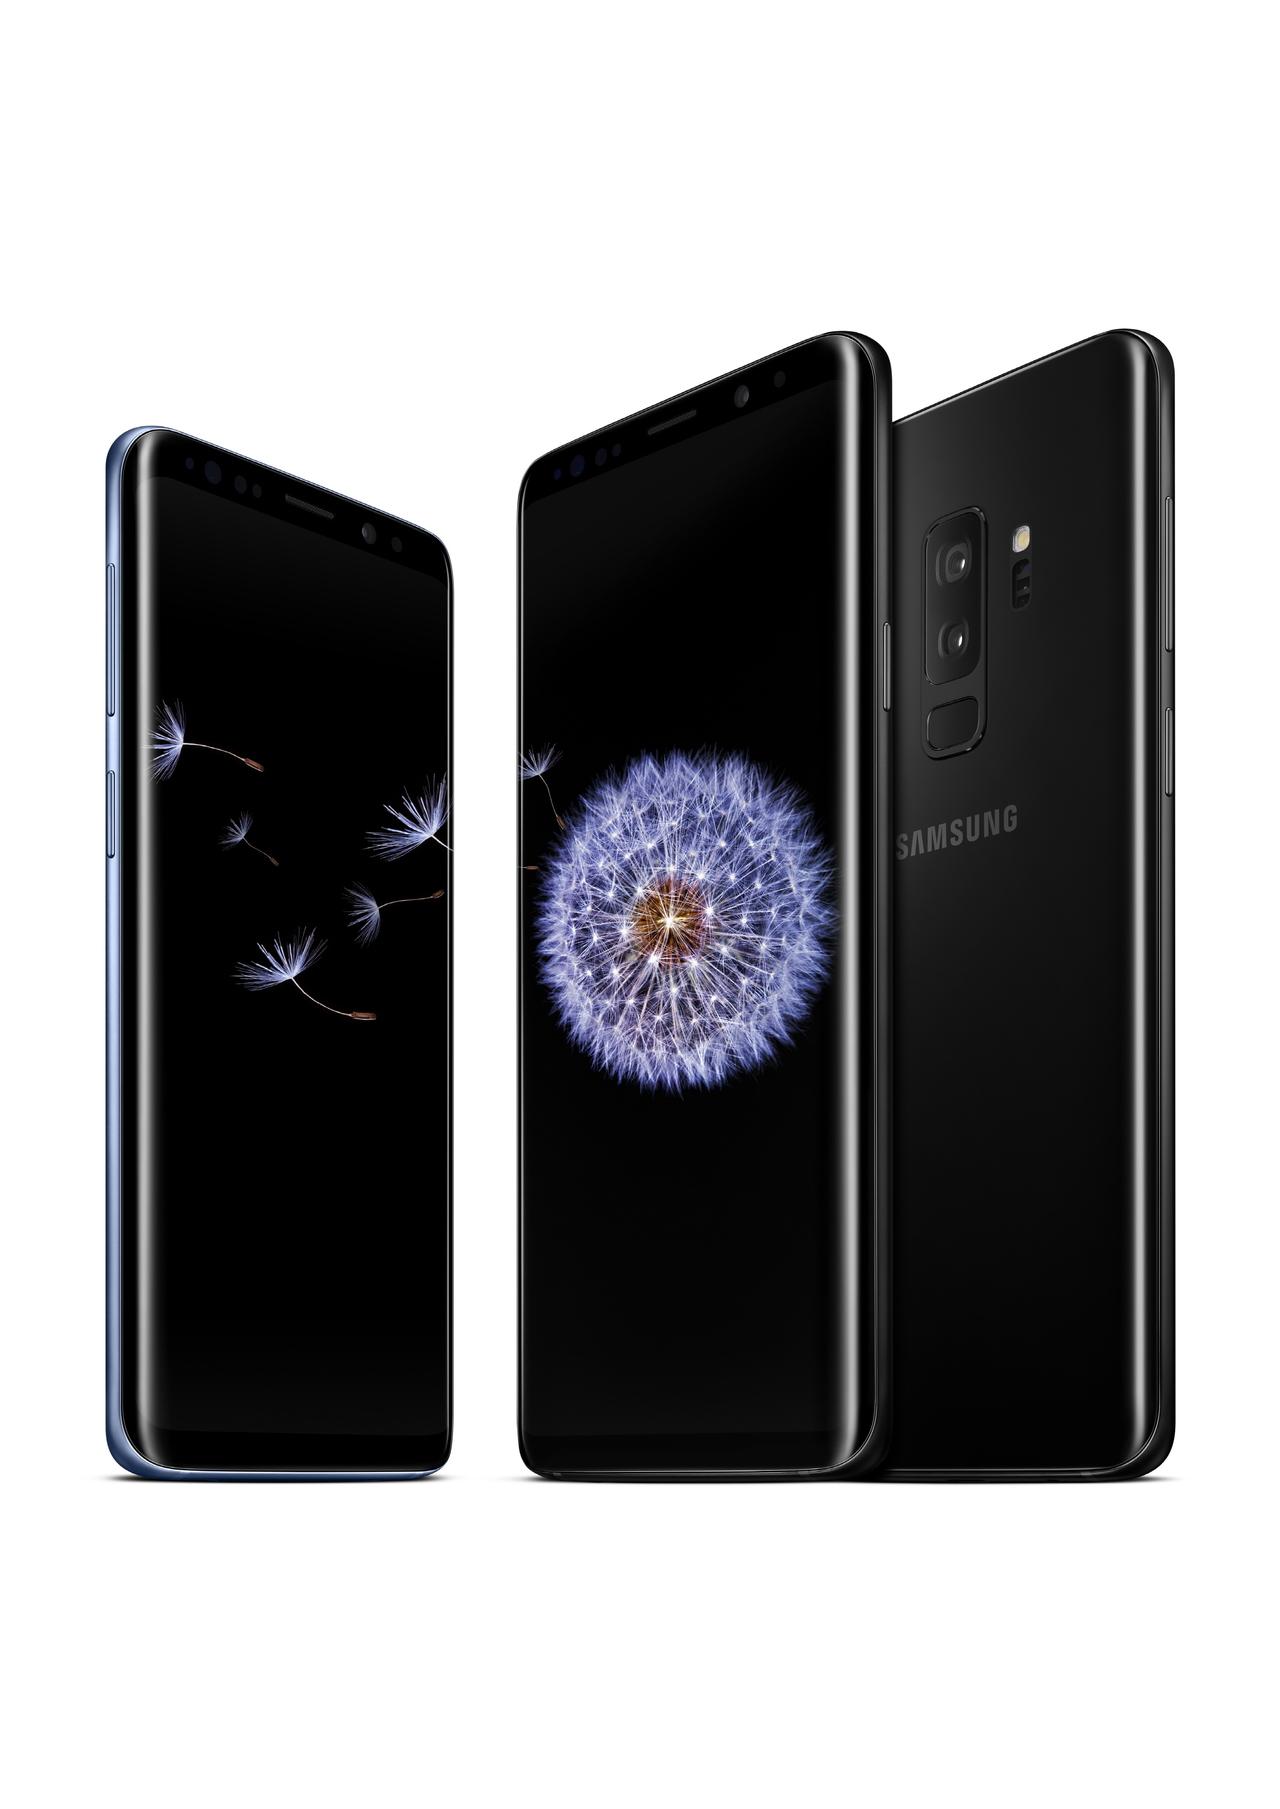 Foto2 Samsung Galaxy S9 in S9 5a93baa72d212